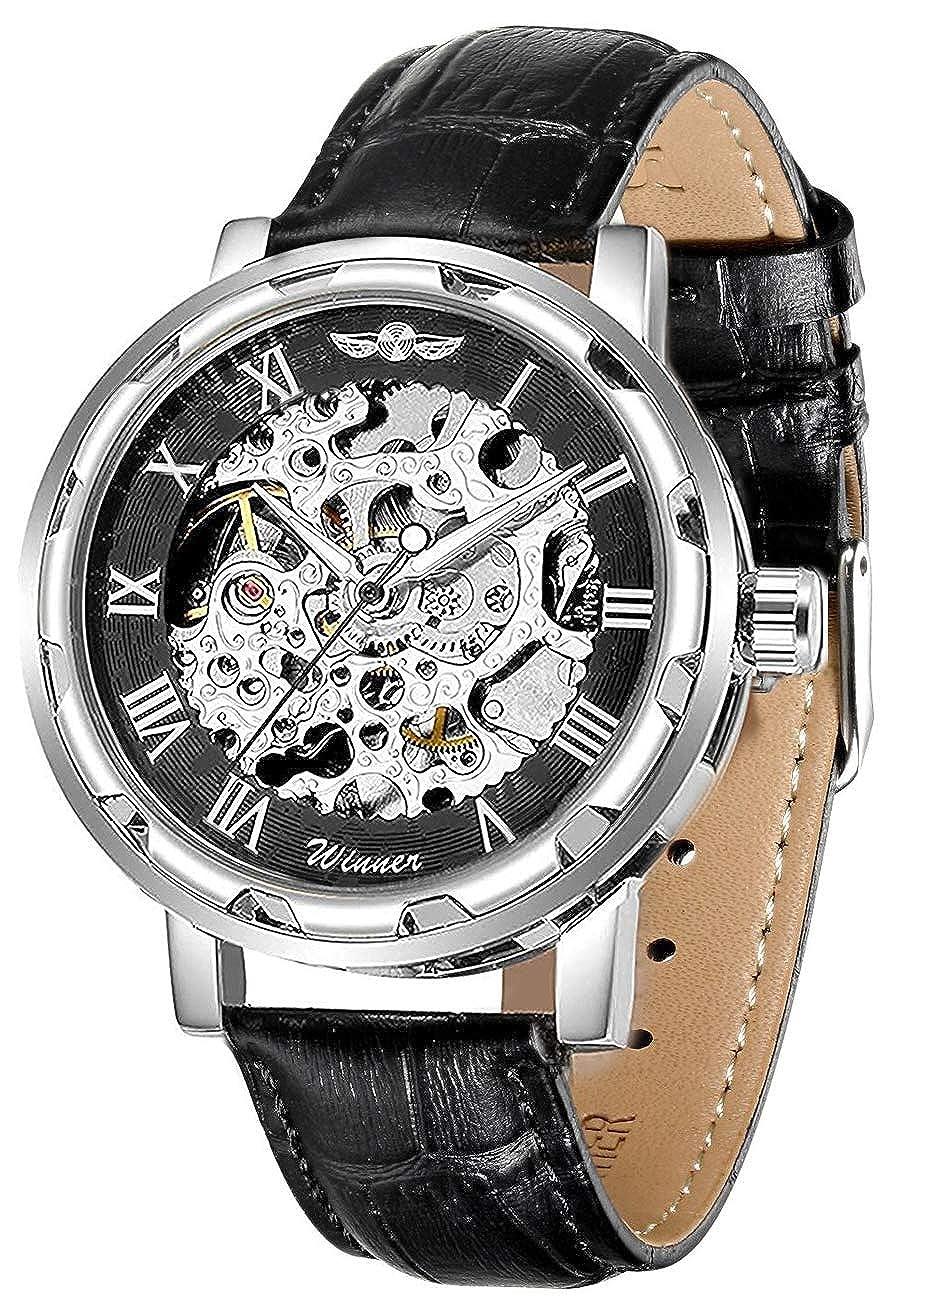 Gute clásico de Vapor Punk automático Auto Viento muñeca Reloj Negro Esqueleto Dial Negro Plata Reloj Caso